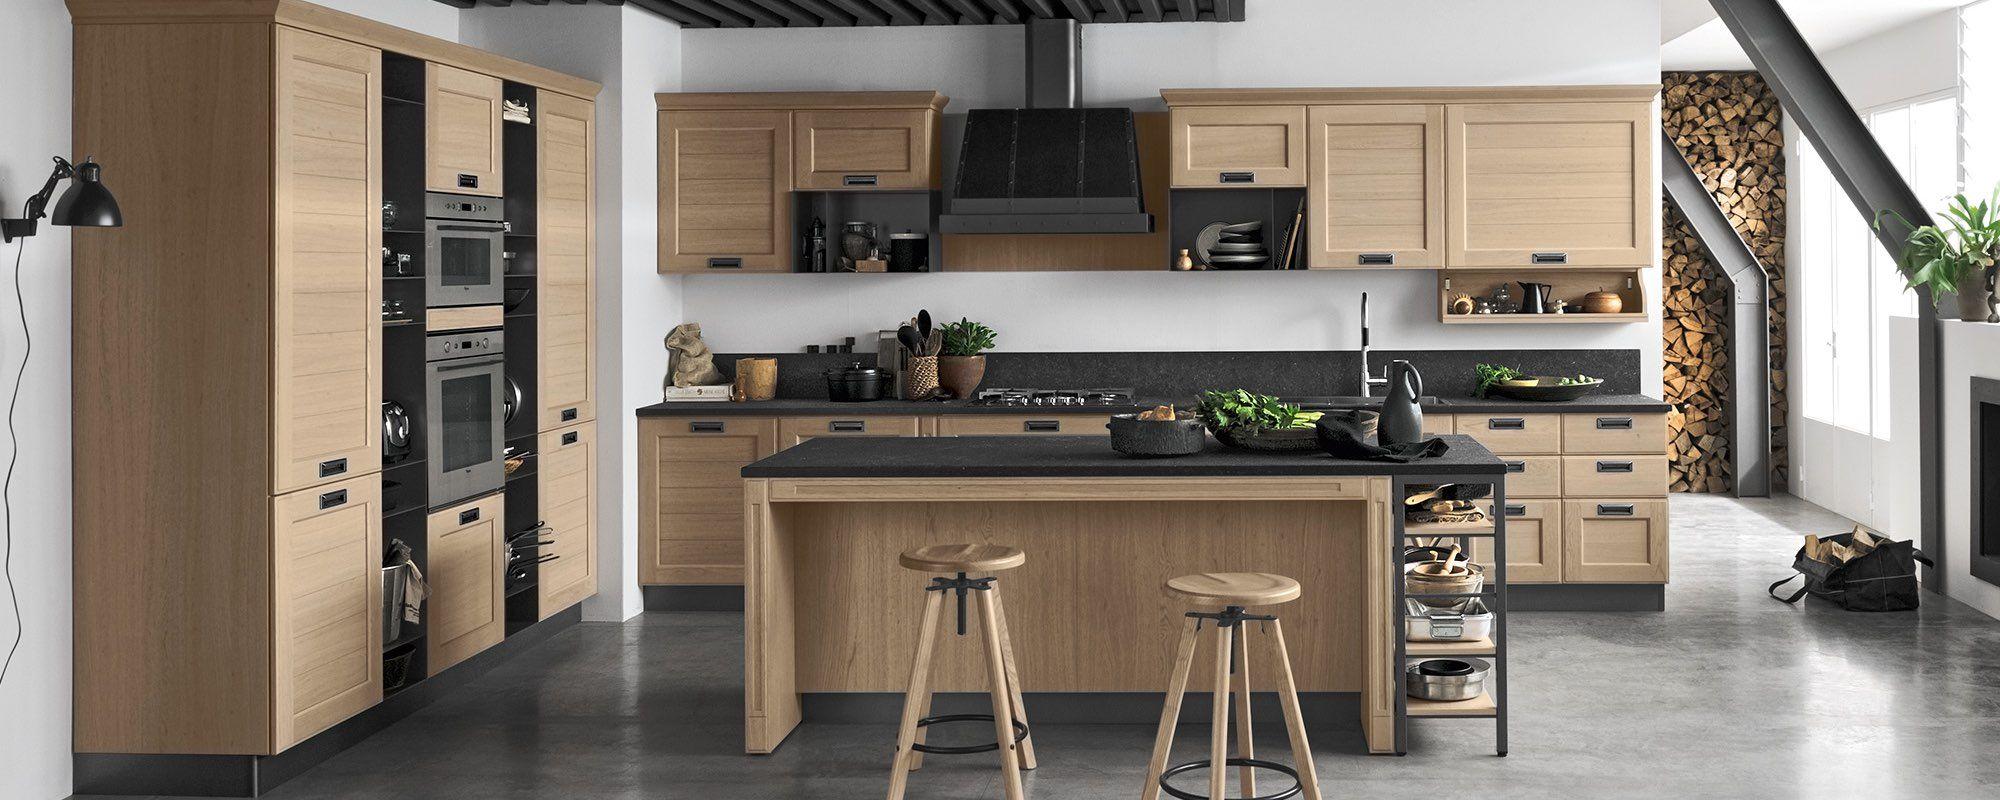 Cucine moderne contemporanee stosa modello cucina york for Modelli sedie cucina